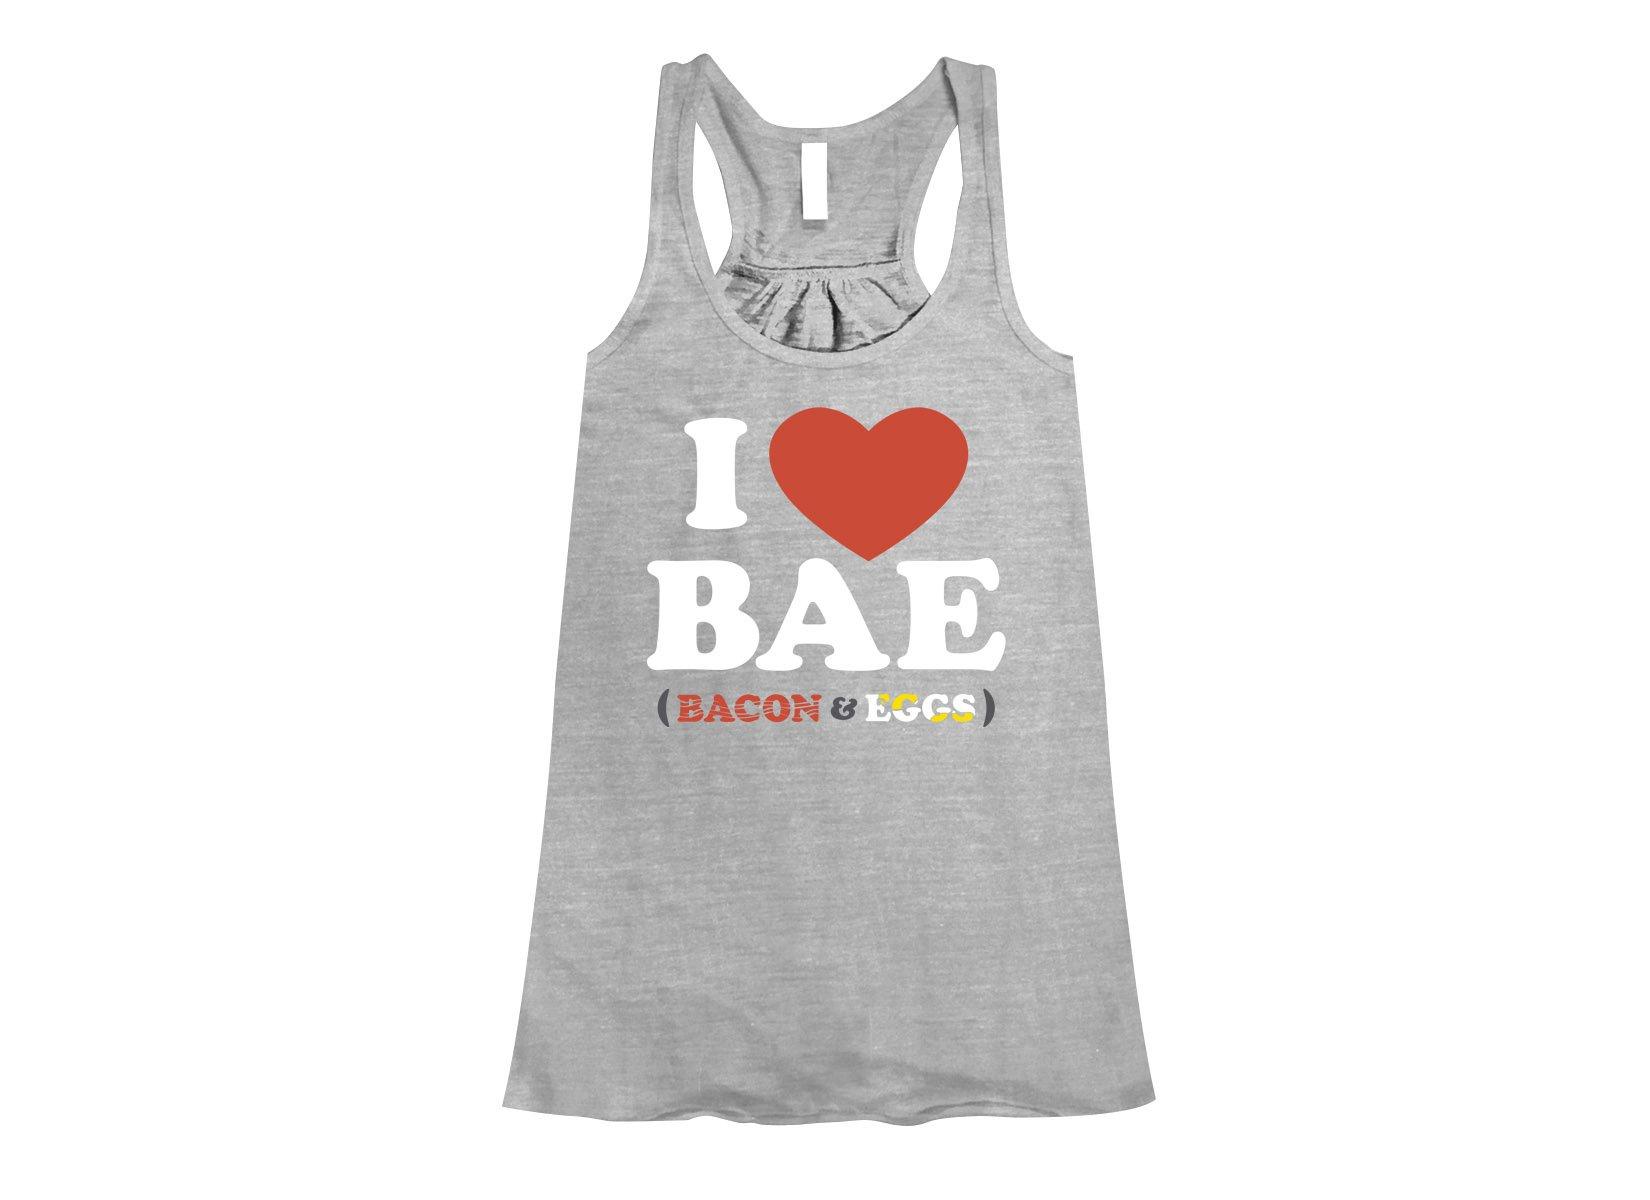 I Heart Bae on Womens Tanks T-Shirt